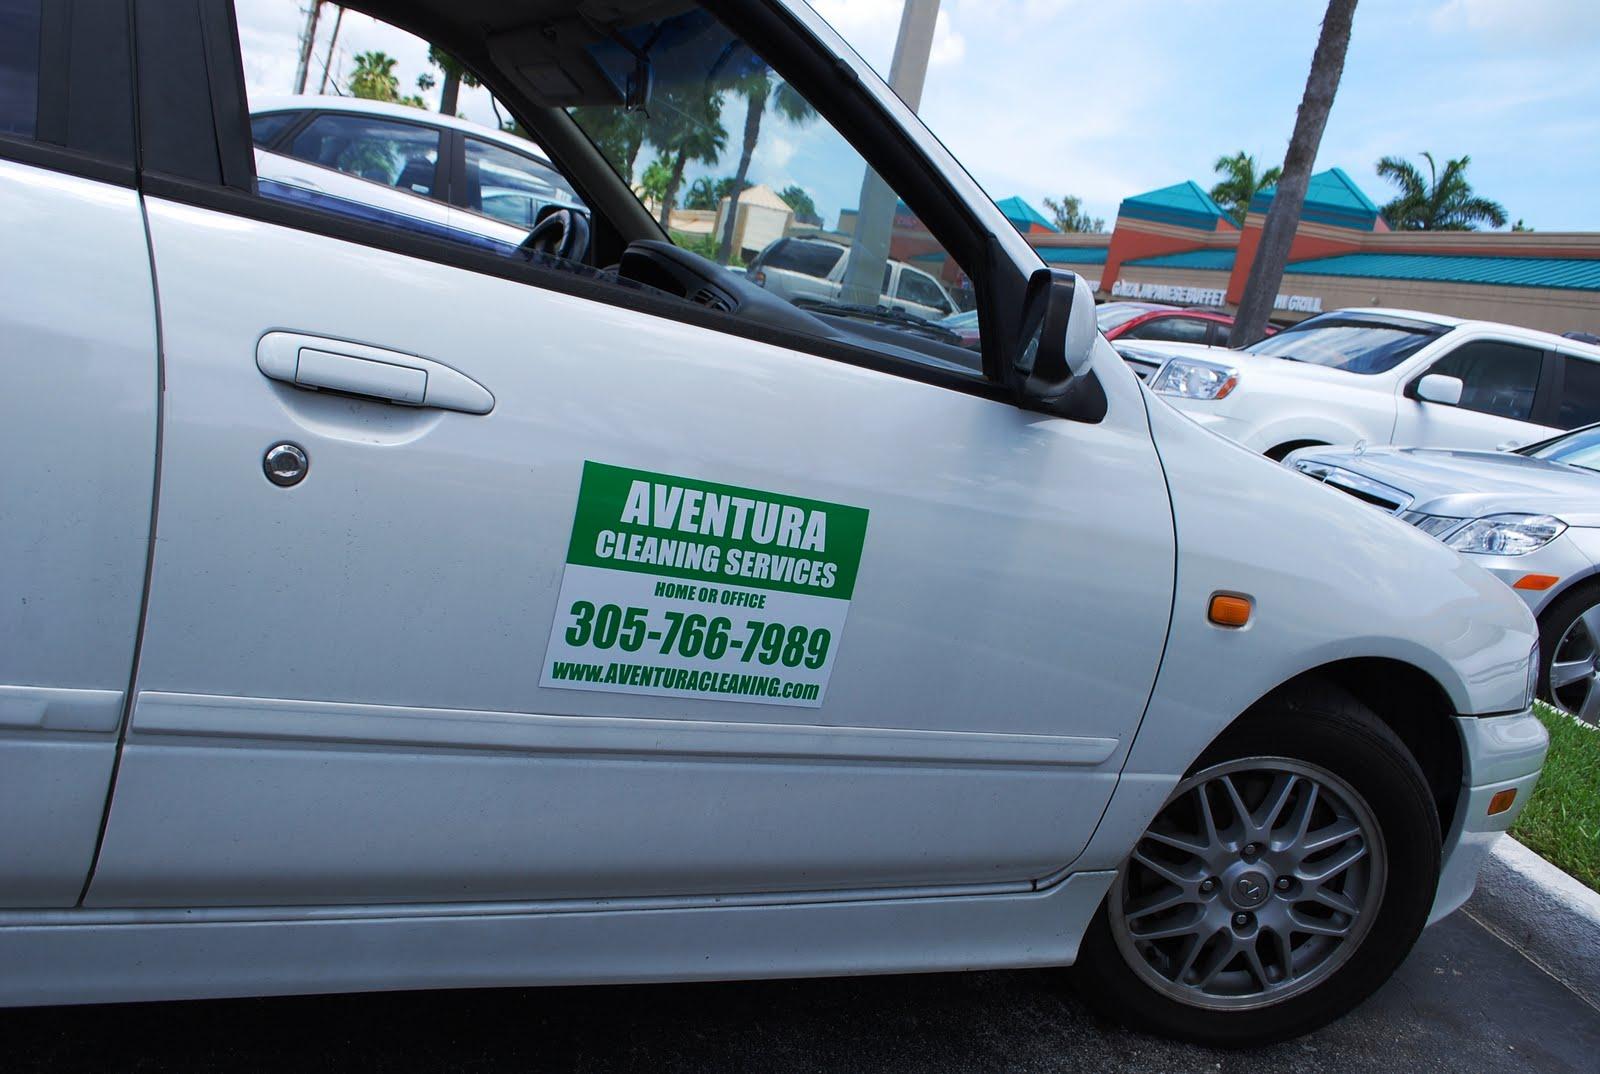 SIGN SHOP MIAMI CUSTOM CAR MAGNETS IN MIAMI - Custom car magnet signs